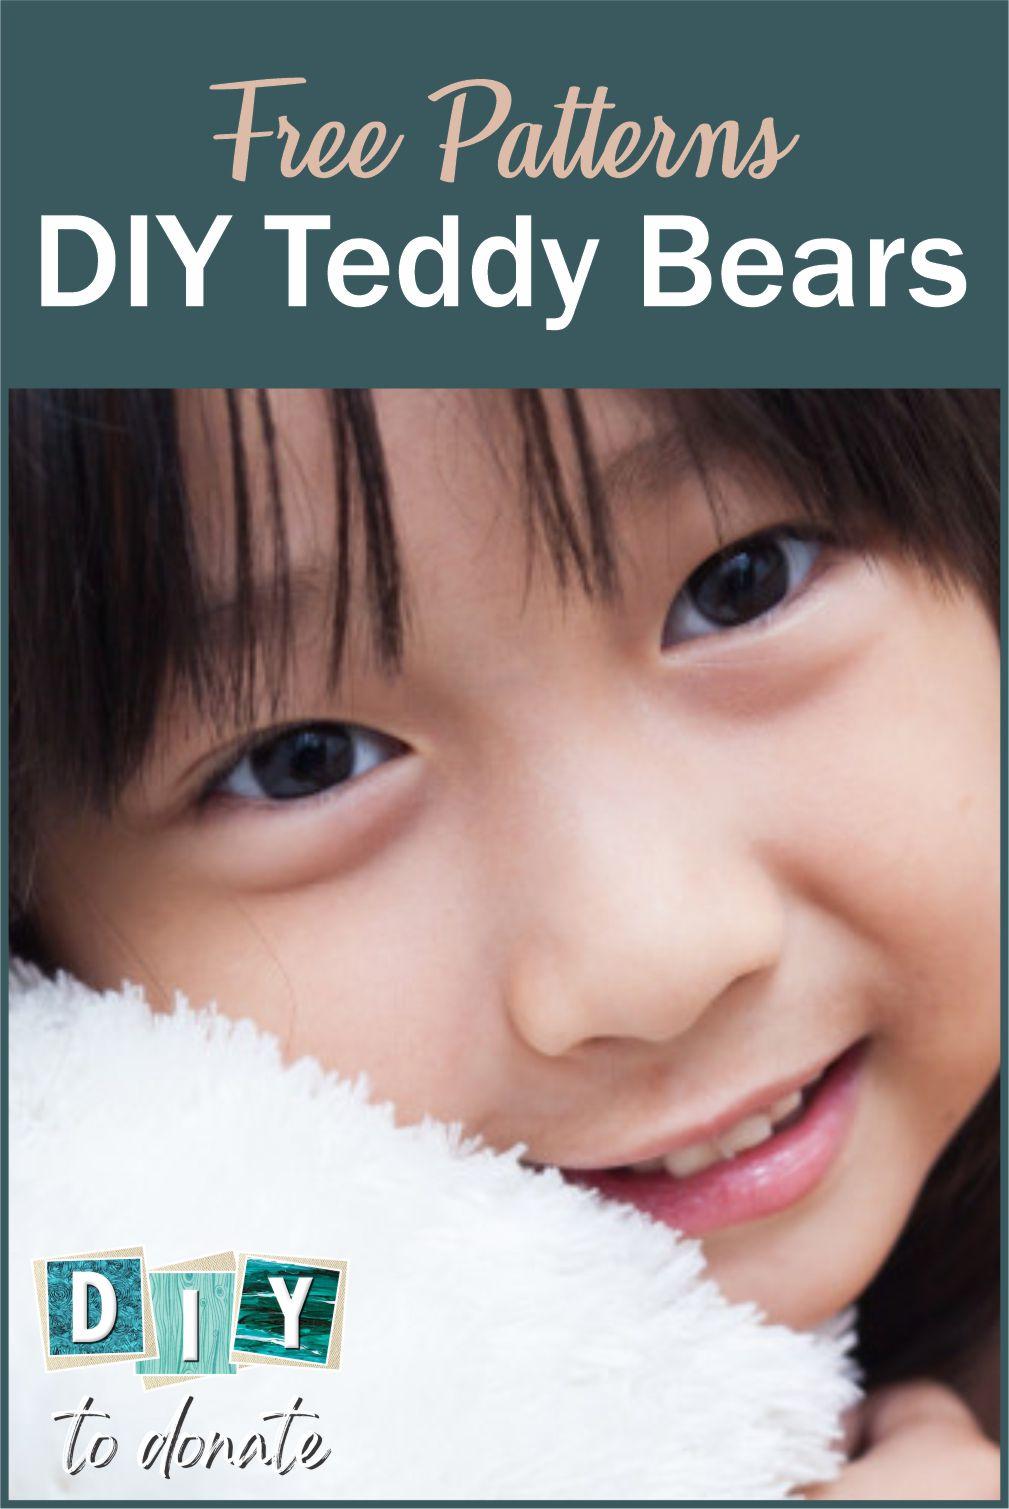 7 Easy DIY Teddy Bears  to Make and Donate